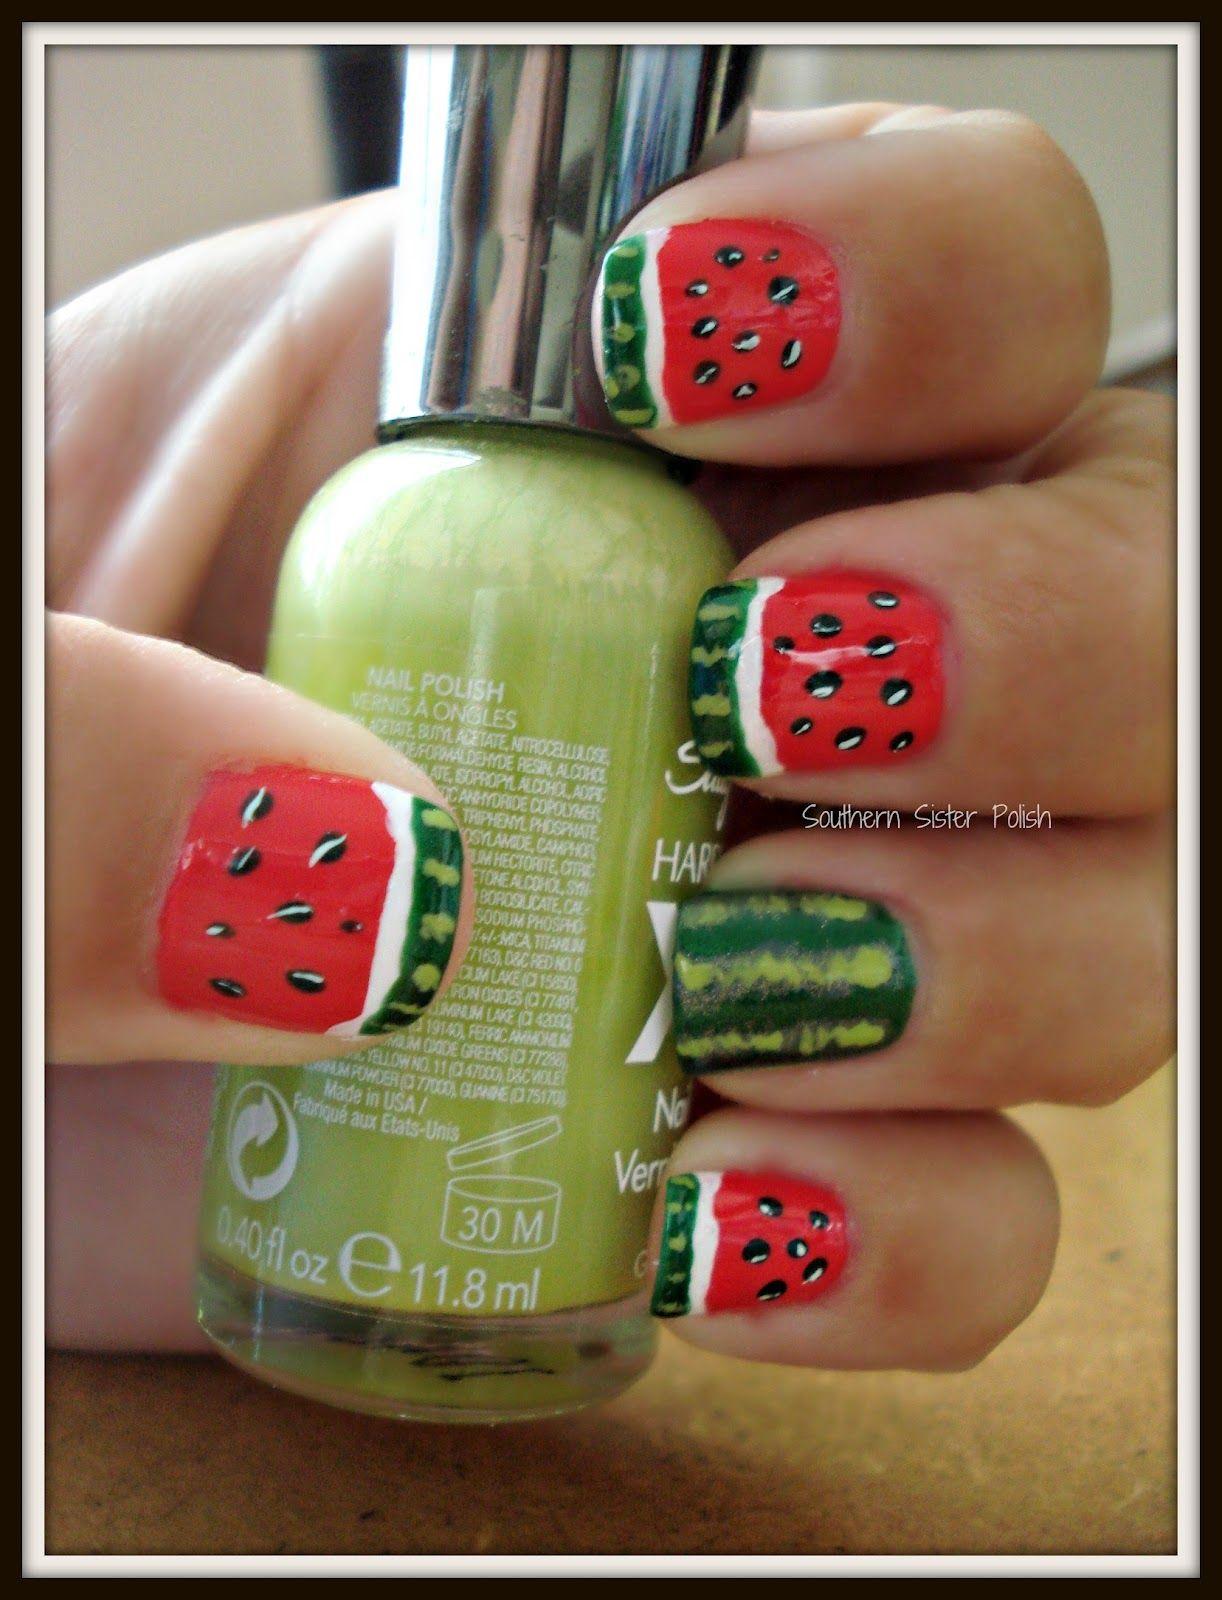 Pin de Audrey Terry en nails | Pinterest